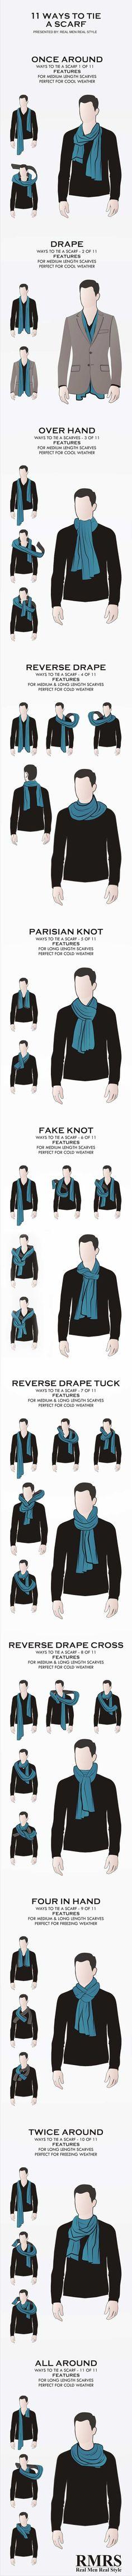 Eleven ways to tie a scarf.